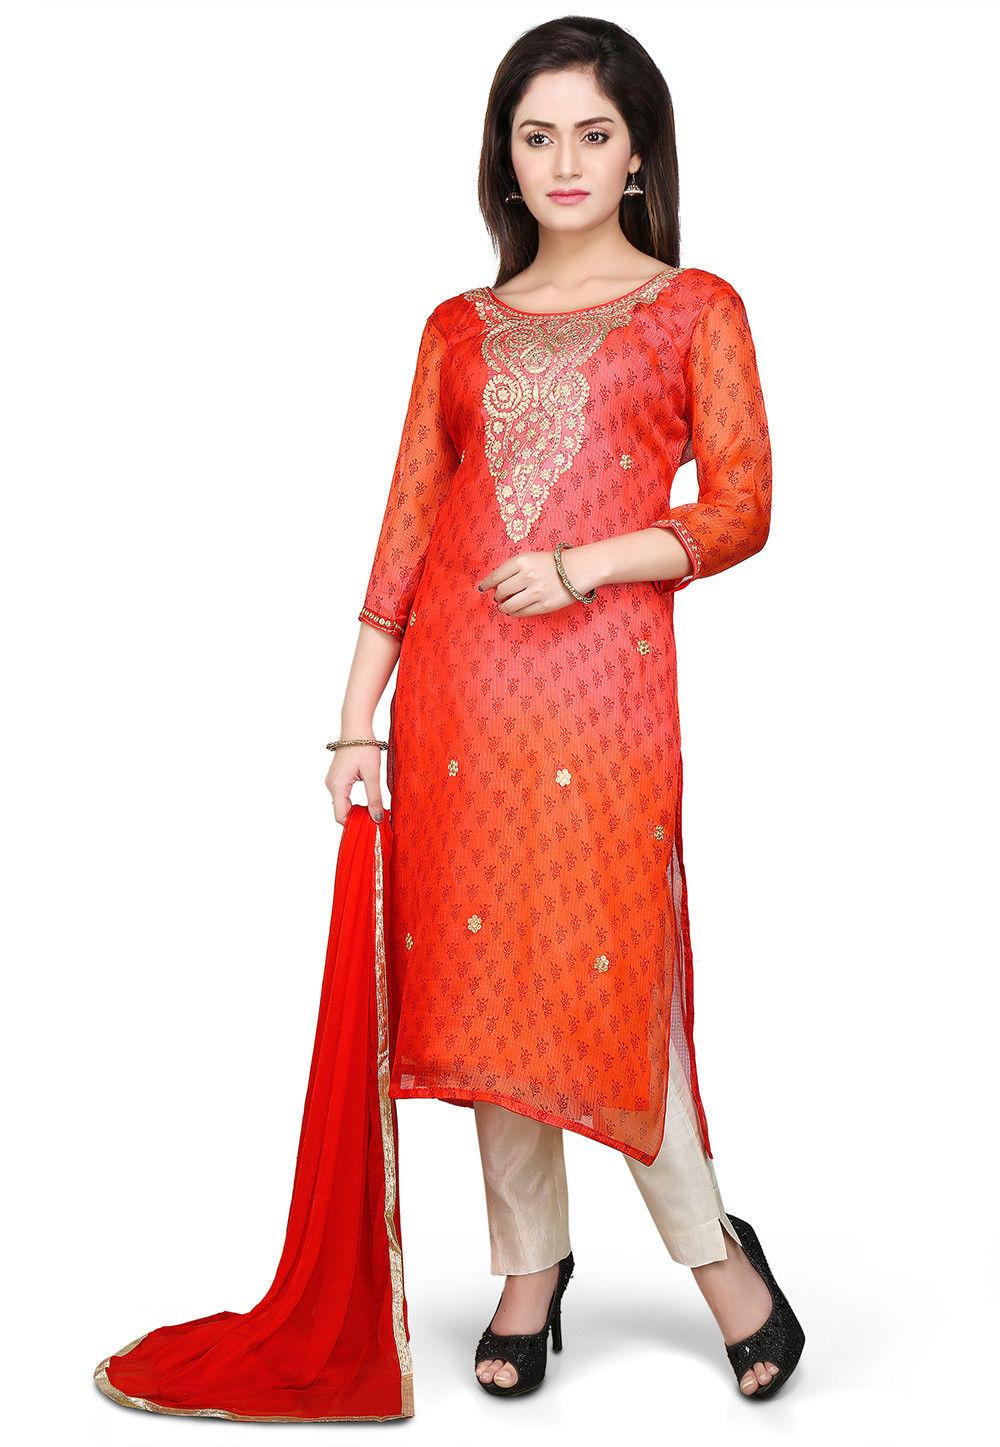 Embroidered Straight Cut Pure Kota Silk Suit in Orange